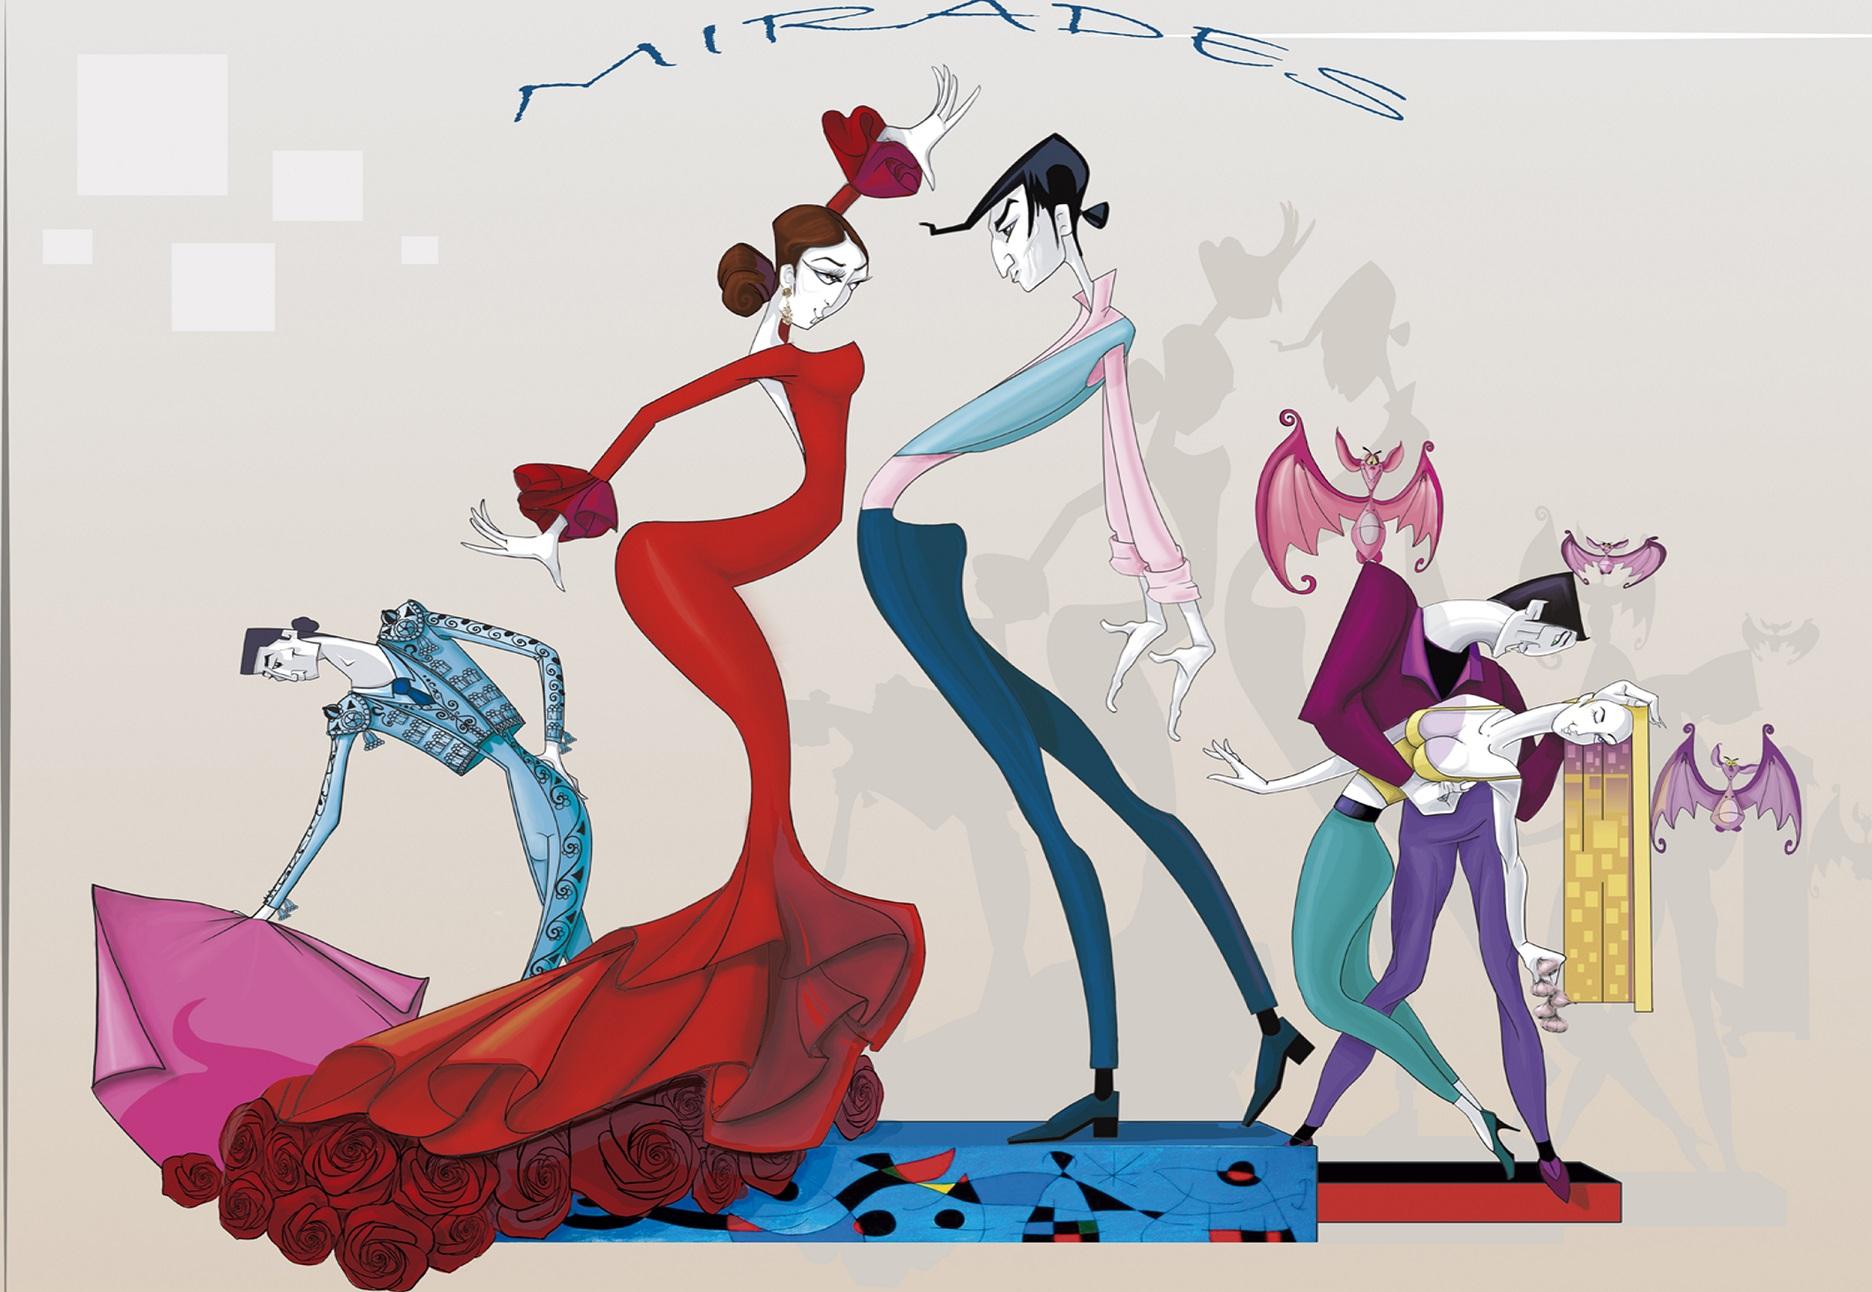 Boceto Falla Mayor 2019 - Lema: Mirades - Autor: Salva Bañuls i Néstor Ruiz